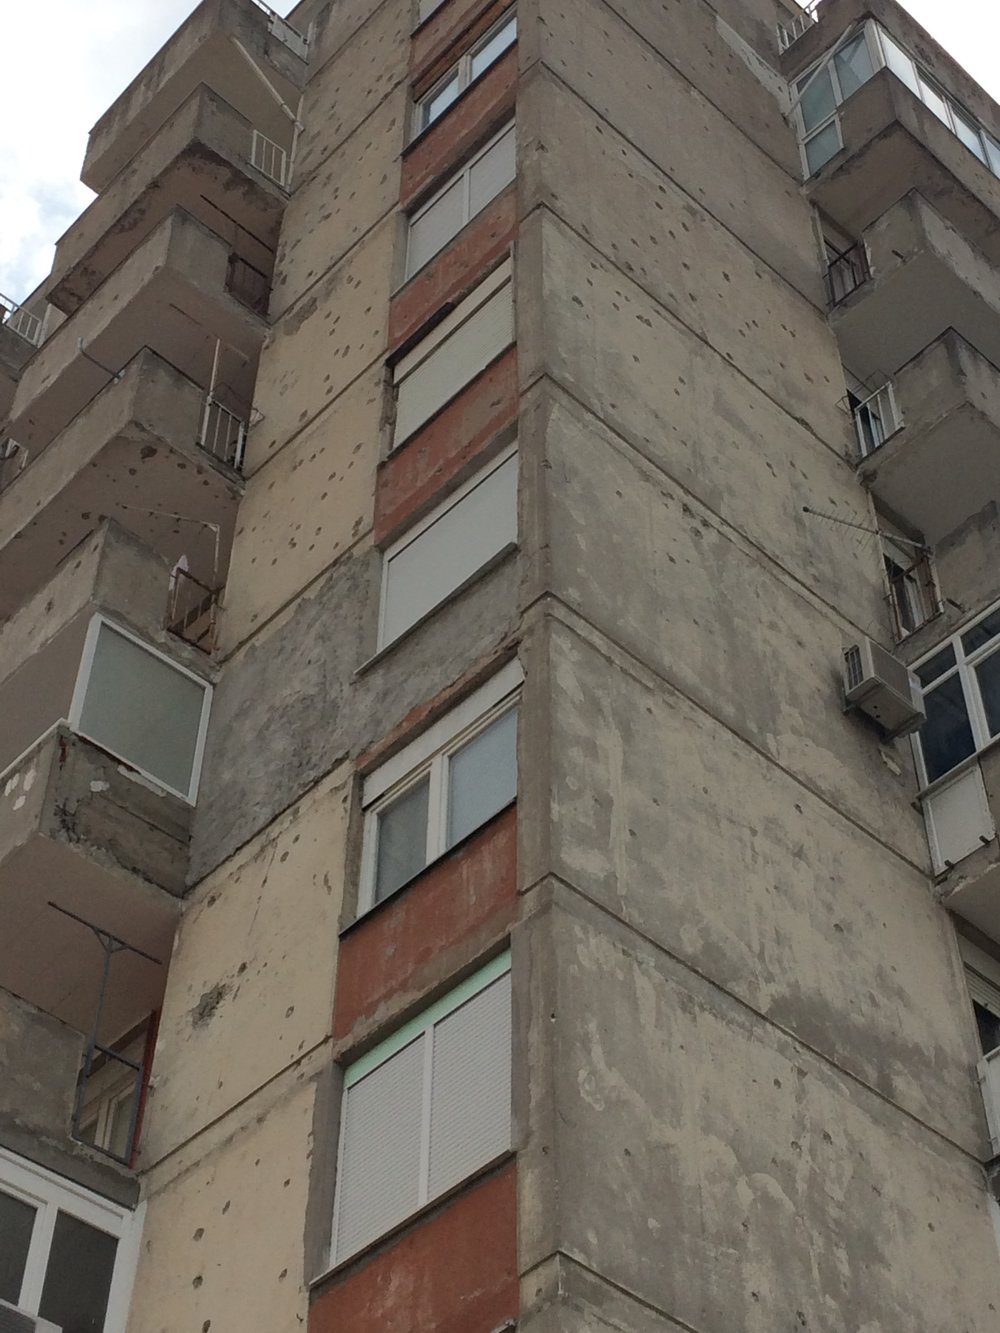 Mostra, Bosnia-Herzegovina